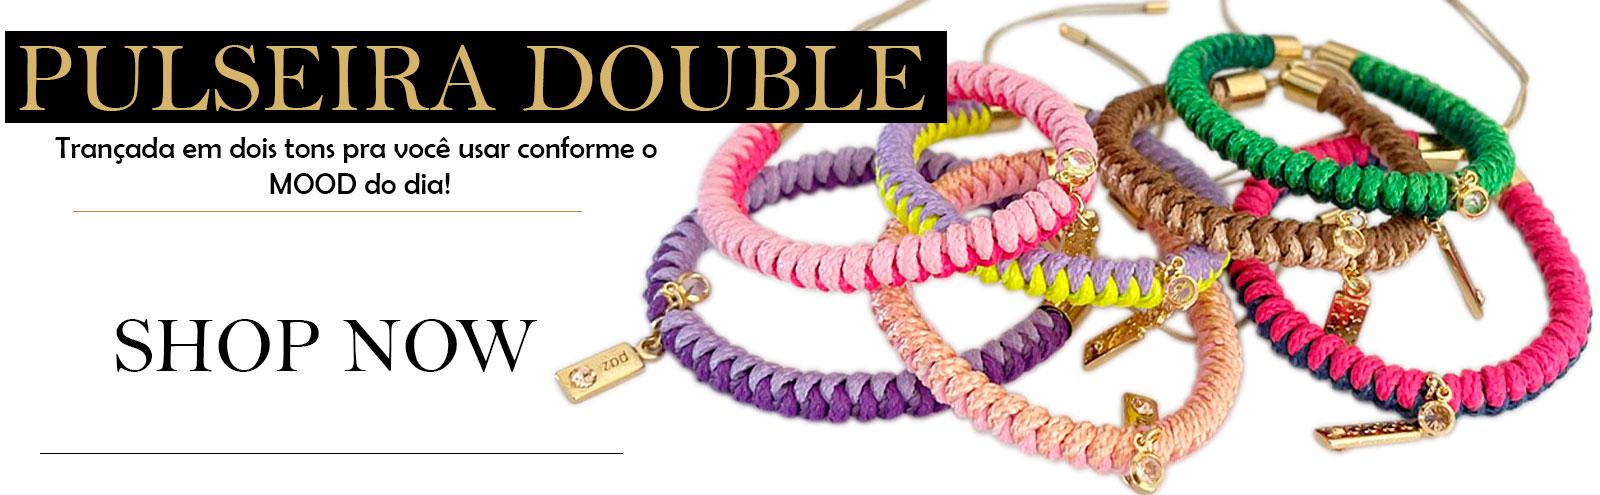 https://anapamplona.com.br/ana-pamplona/pulseiras/pulseira-double/